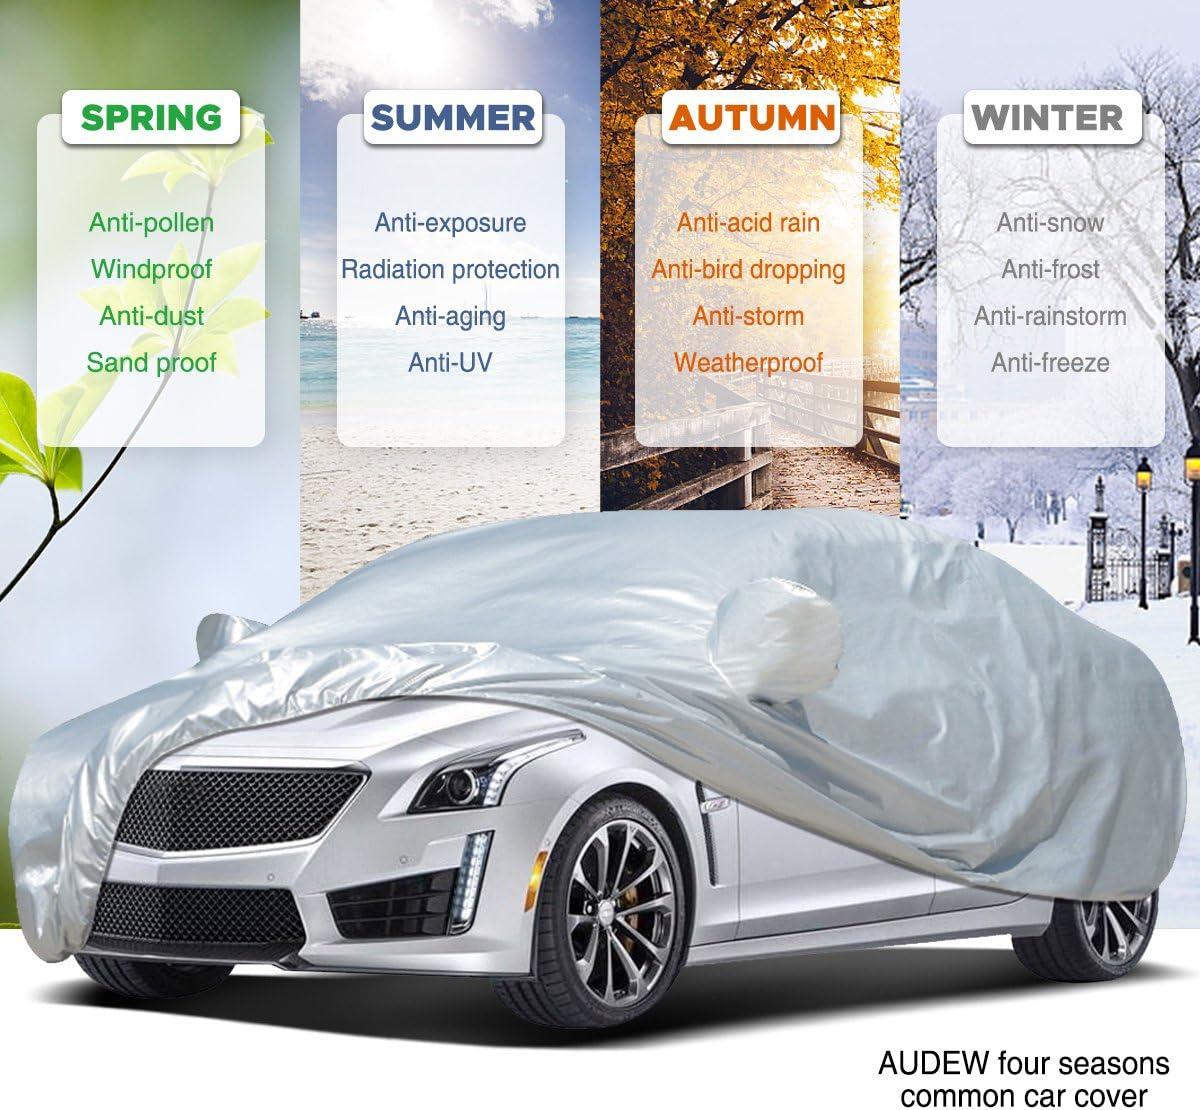 Audew Car Cover Sedan Cover 2019 Upgrade UV Protection//Waterproof//Windproof//Dustproof//Scratch Resistant Outdoor Full Car Covers for Sedan L 177-191